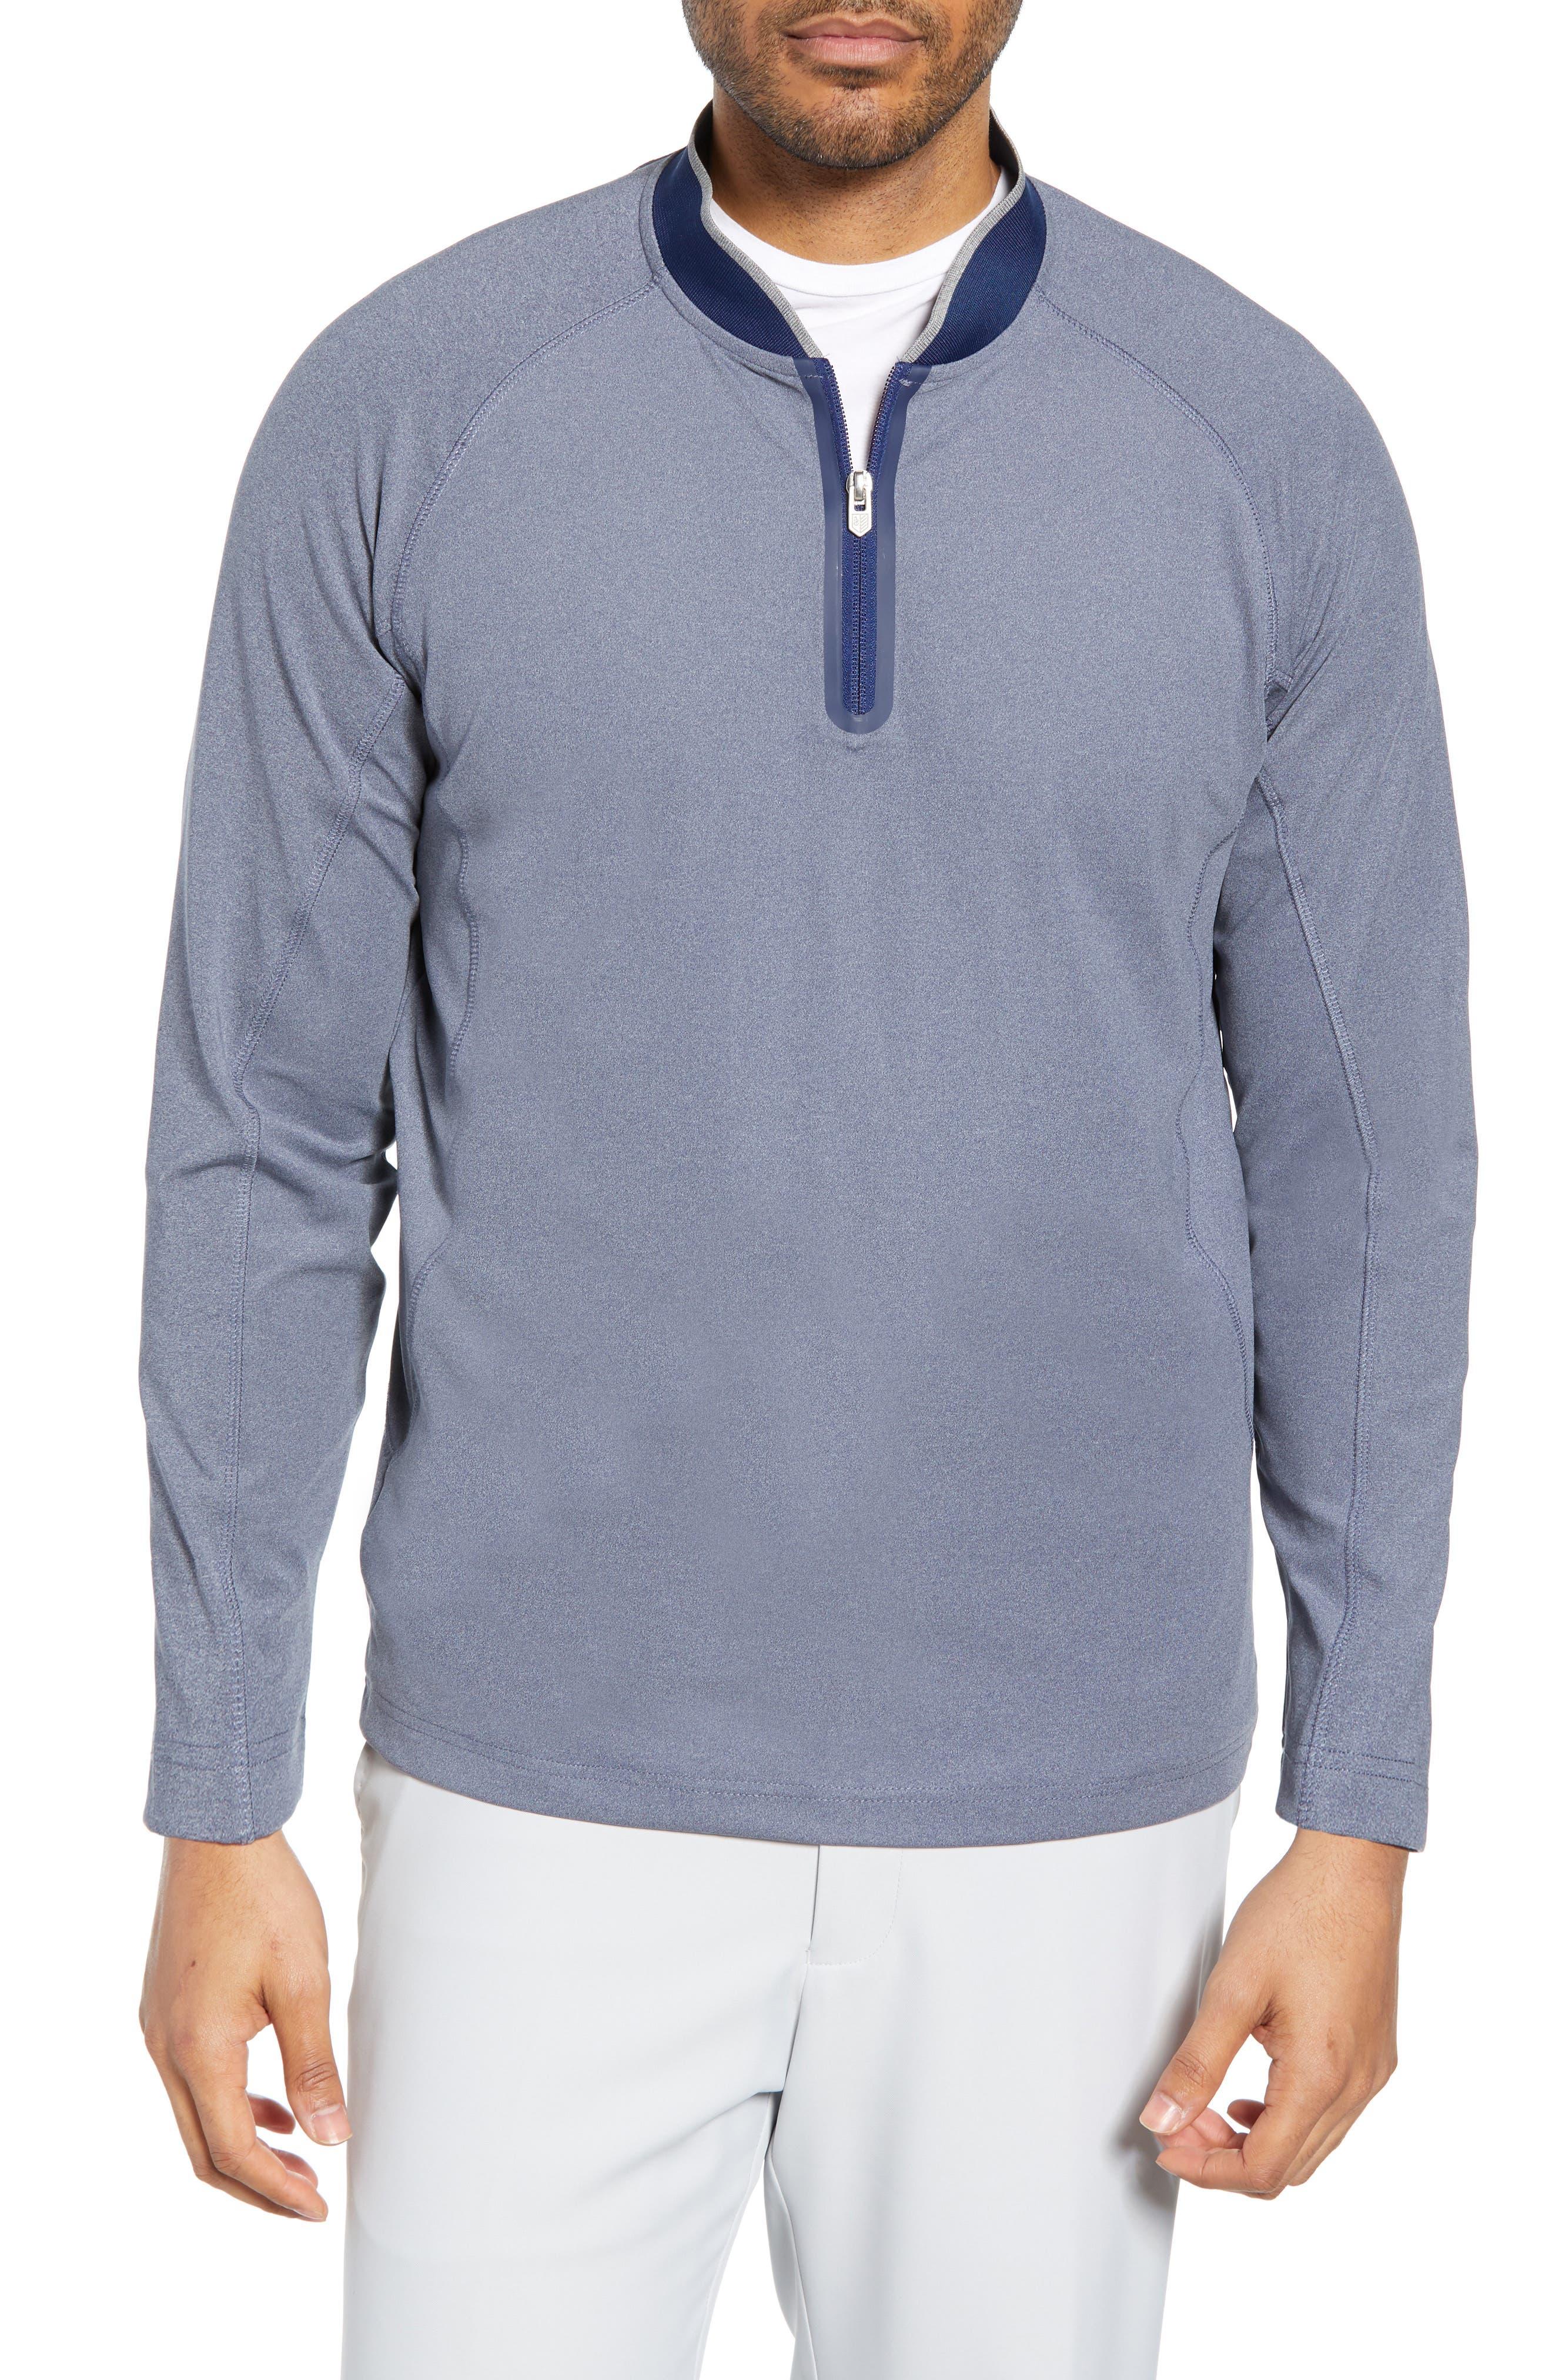 BOBBY JONES Rule 18 Quarter Zip Tech Pullover, Main, color, NAVY